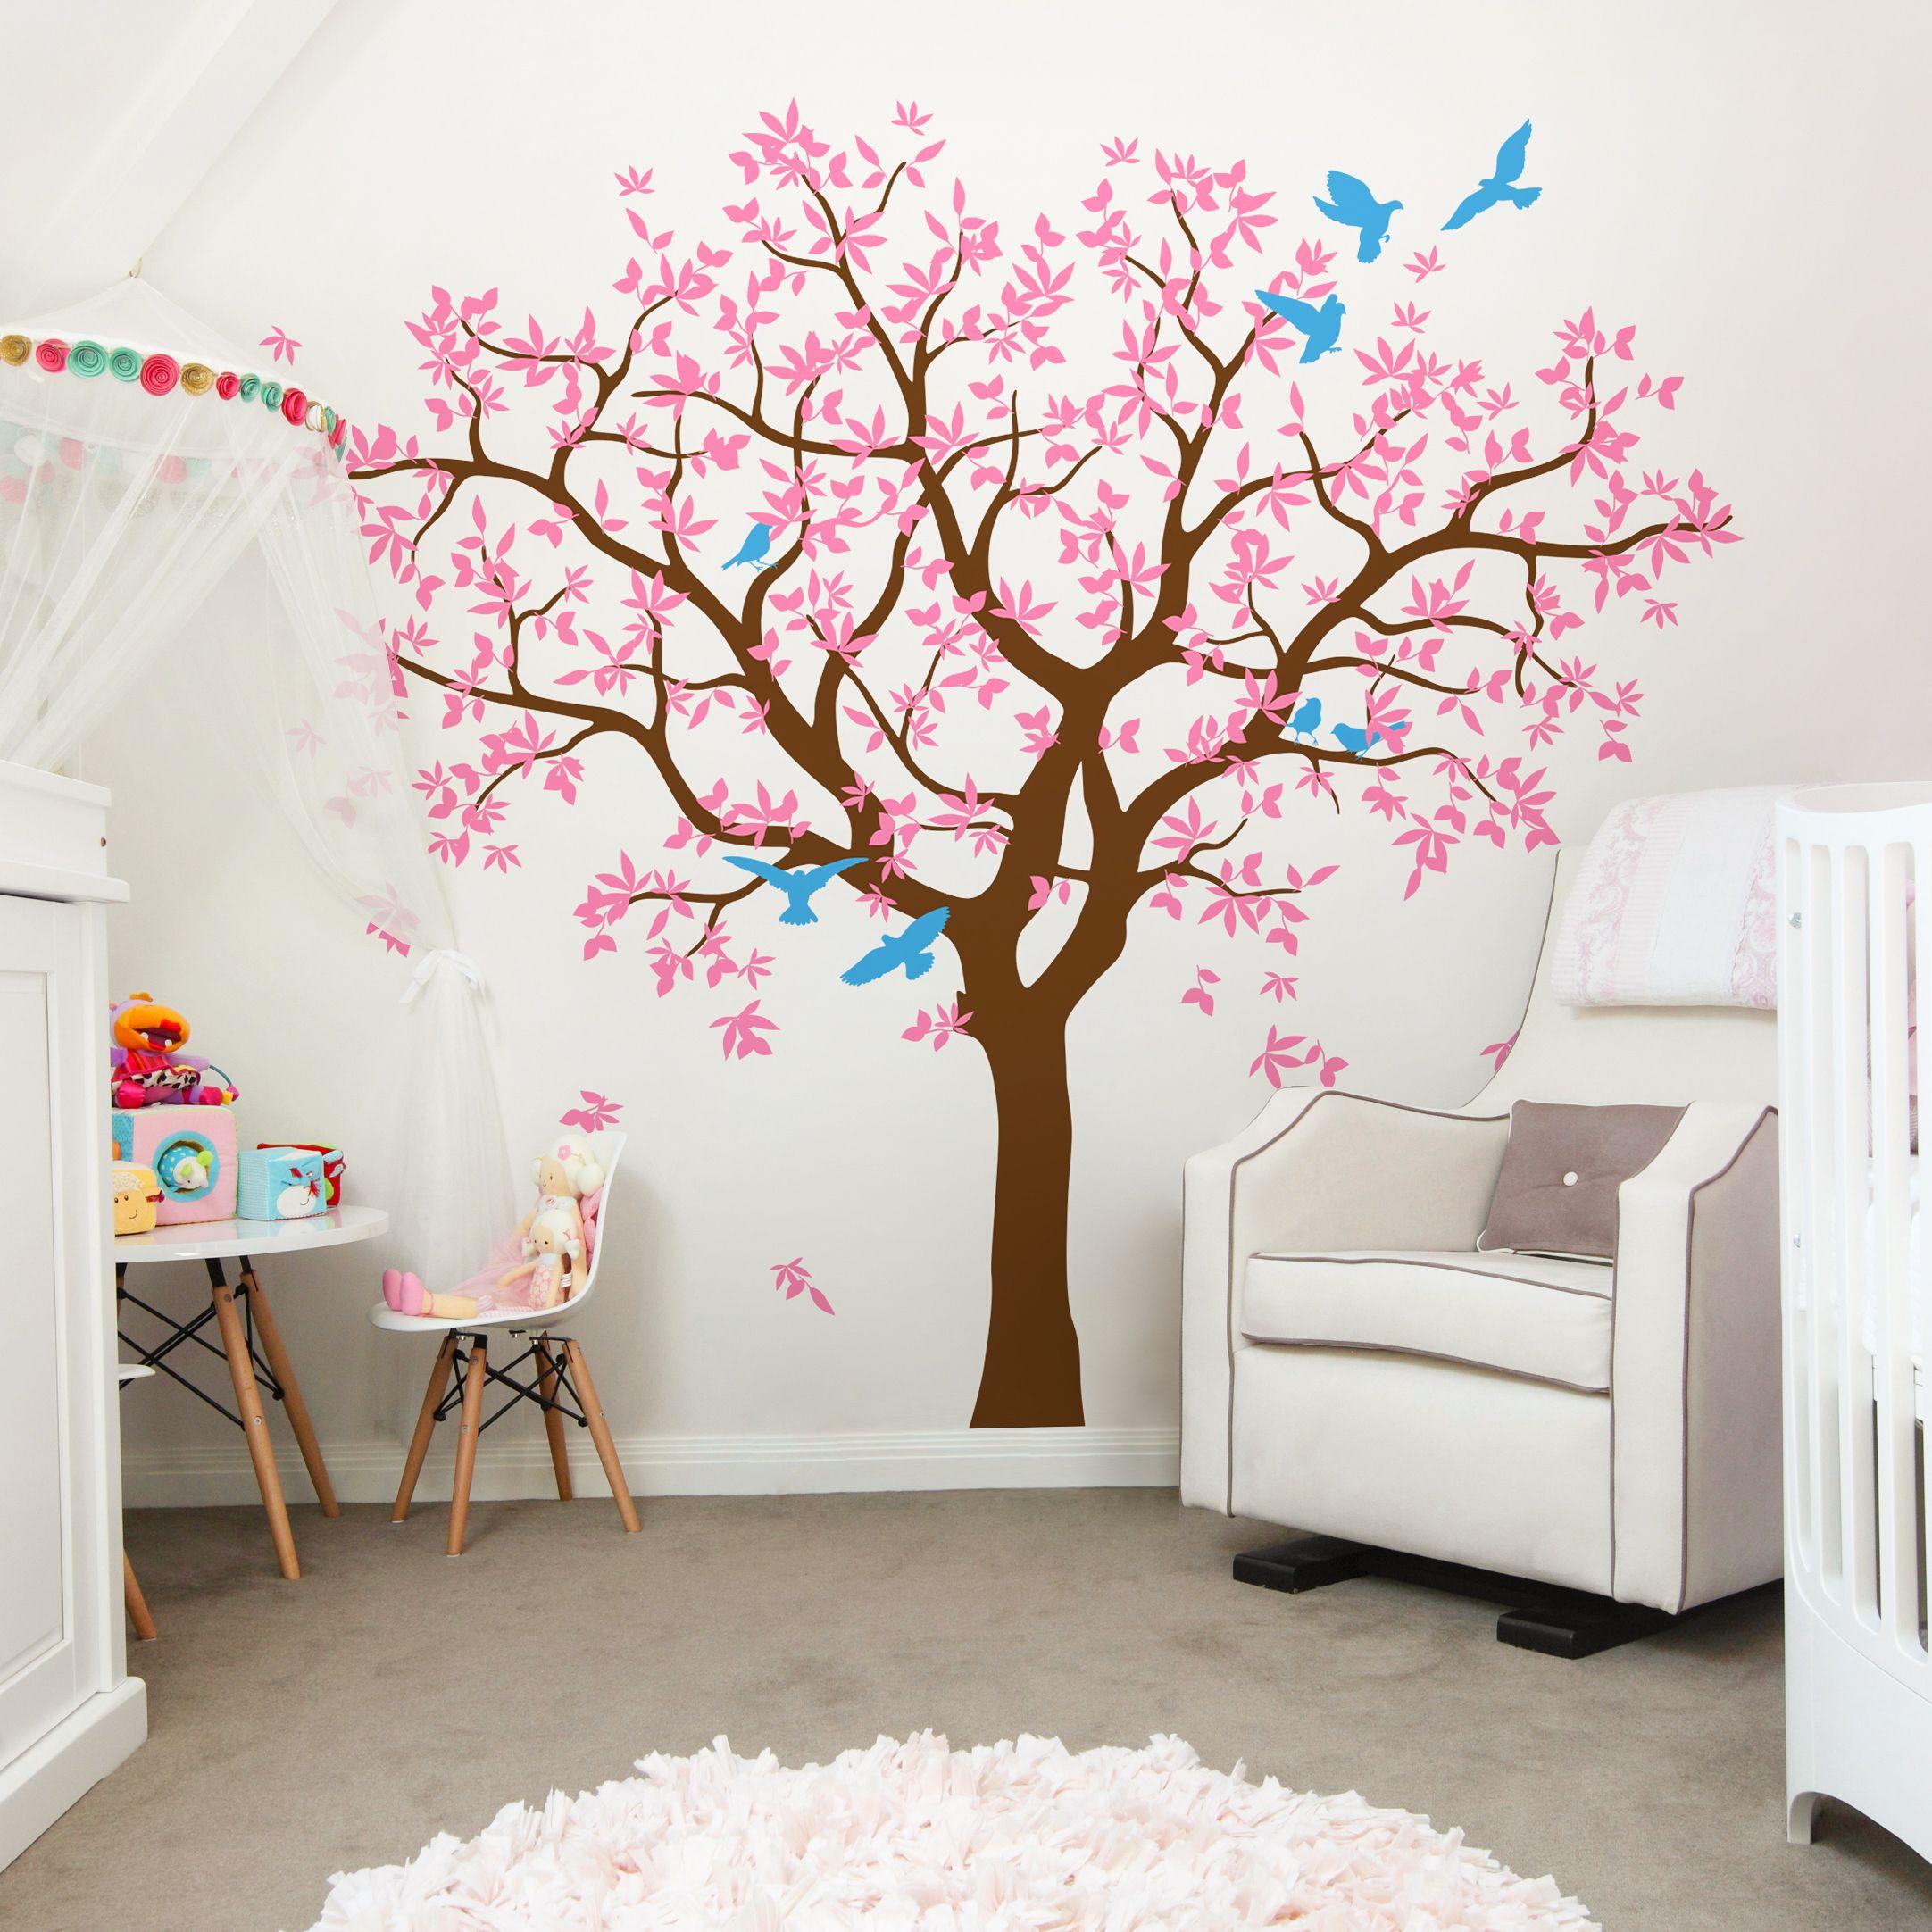 Pink Tree Wall Decal Tree Kidroom Family Decal Deaign